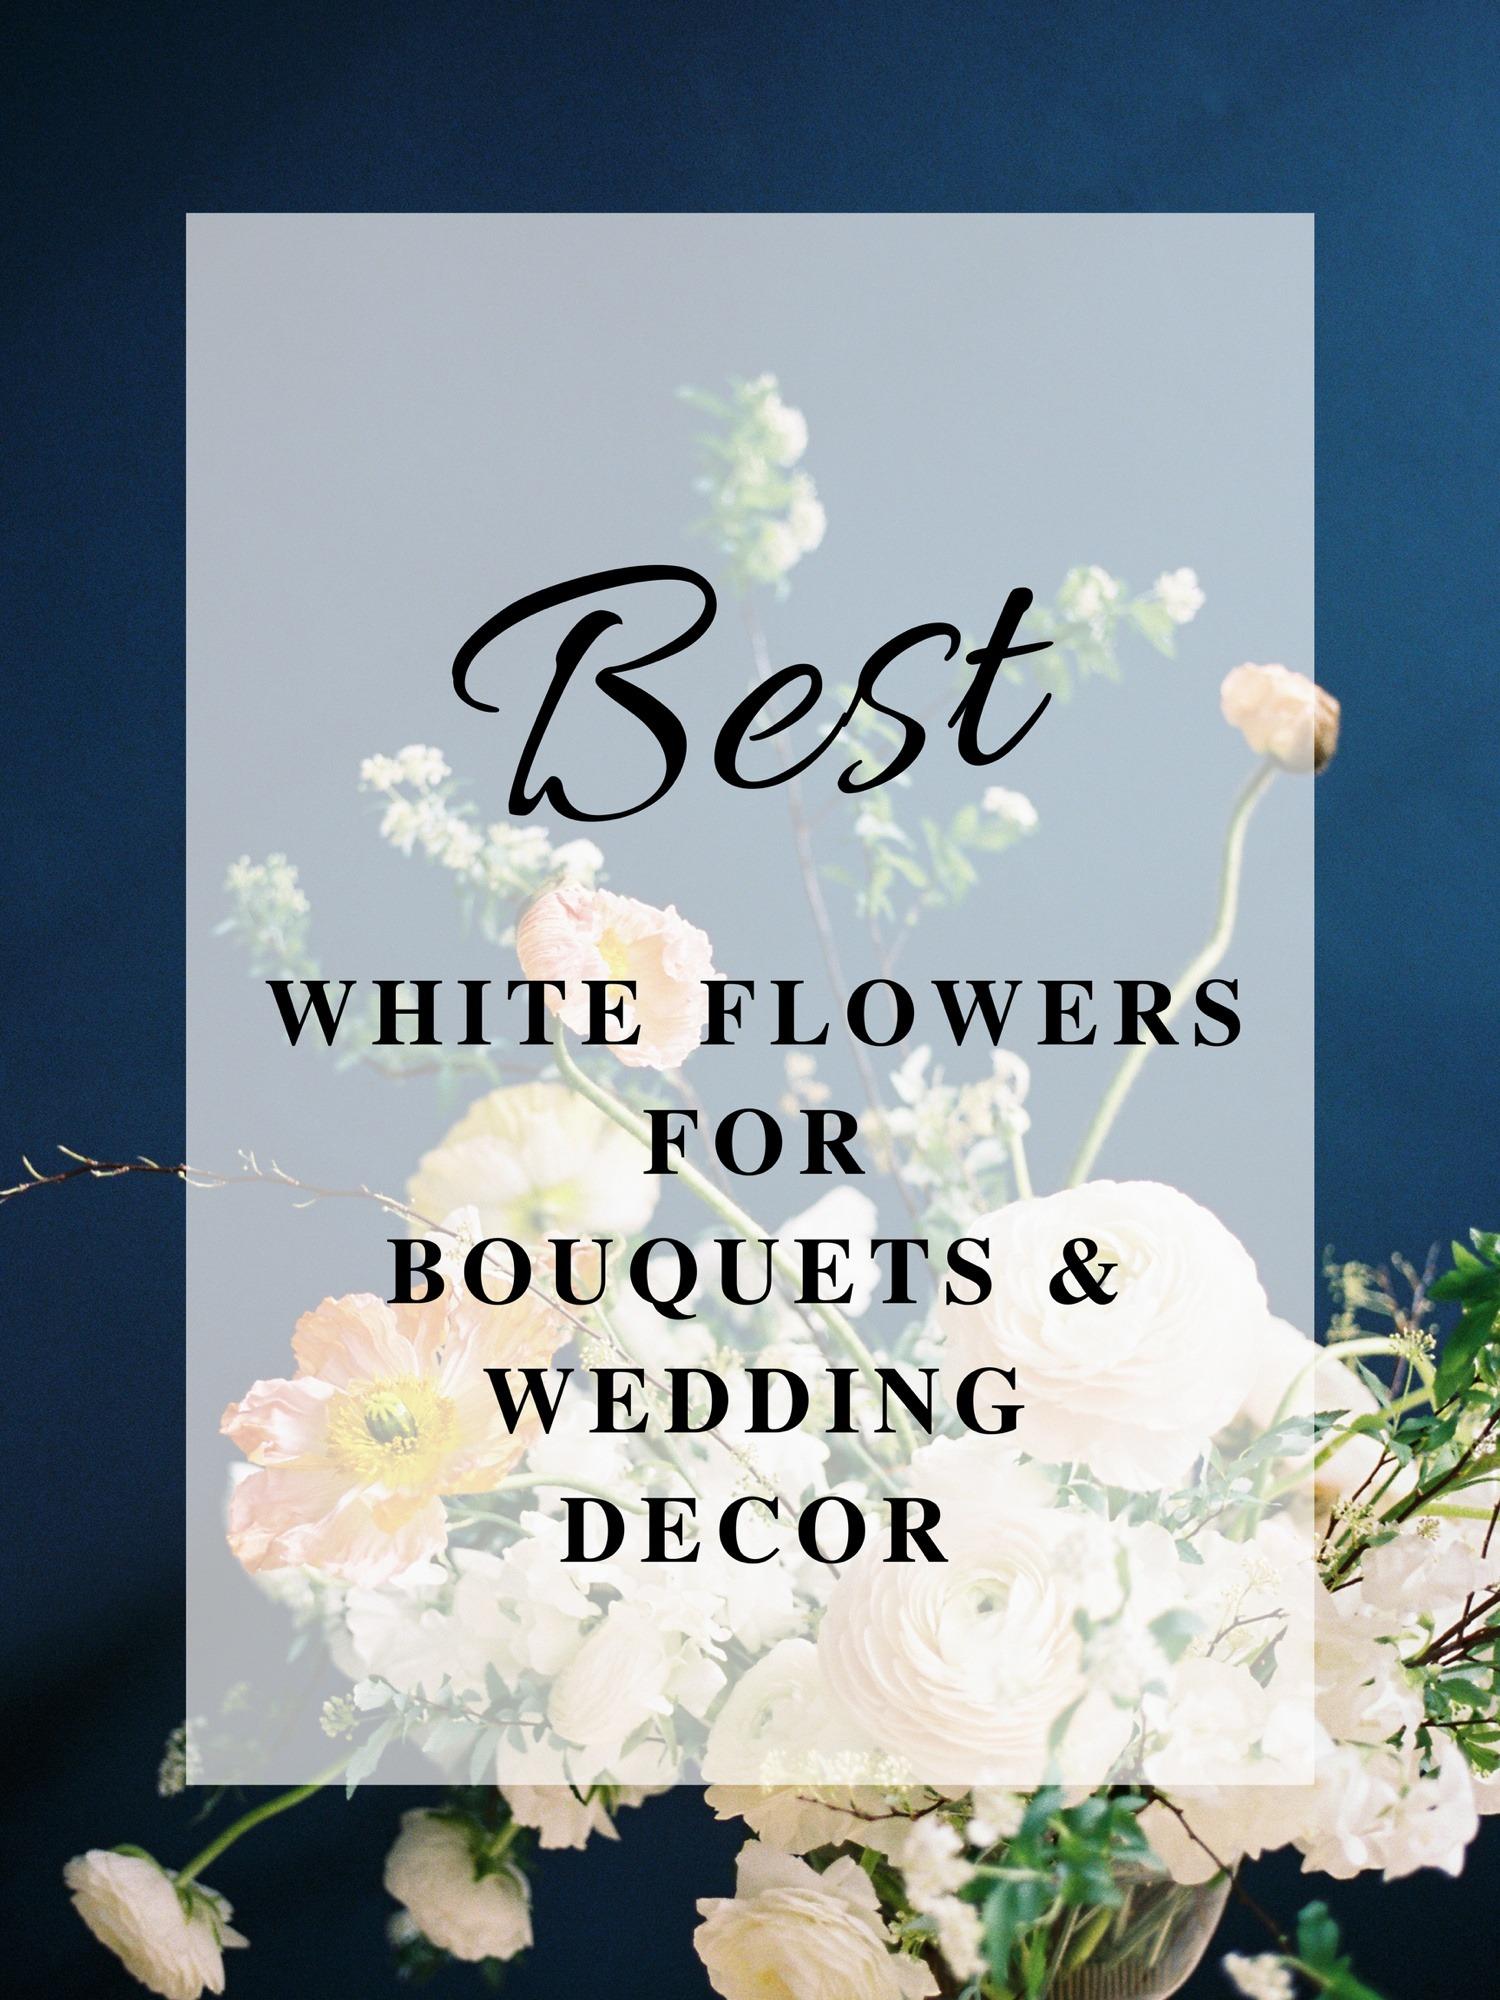 Best white flowers for bouquets and wedding decor ohio florist izmirmasajfo